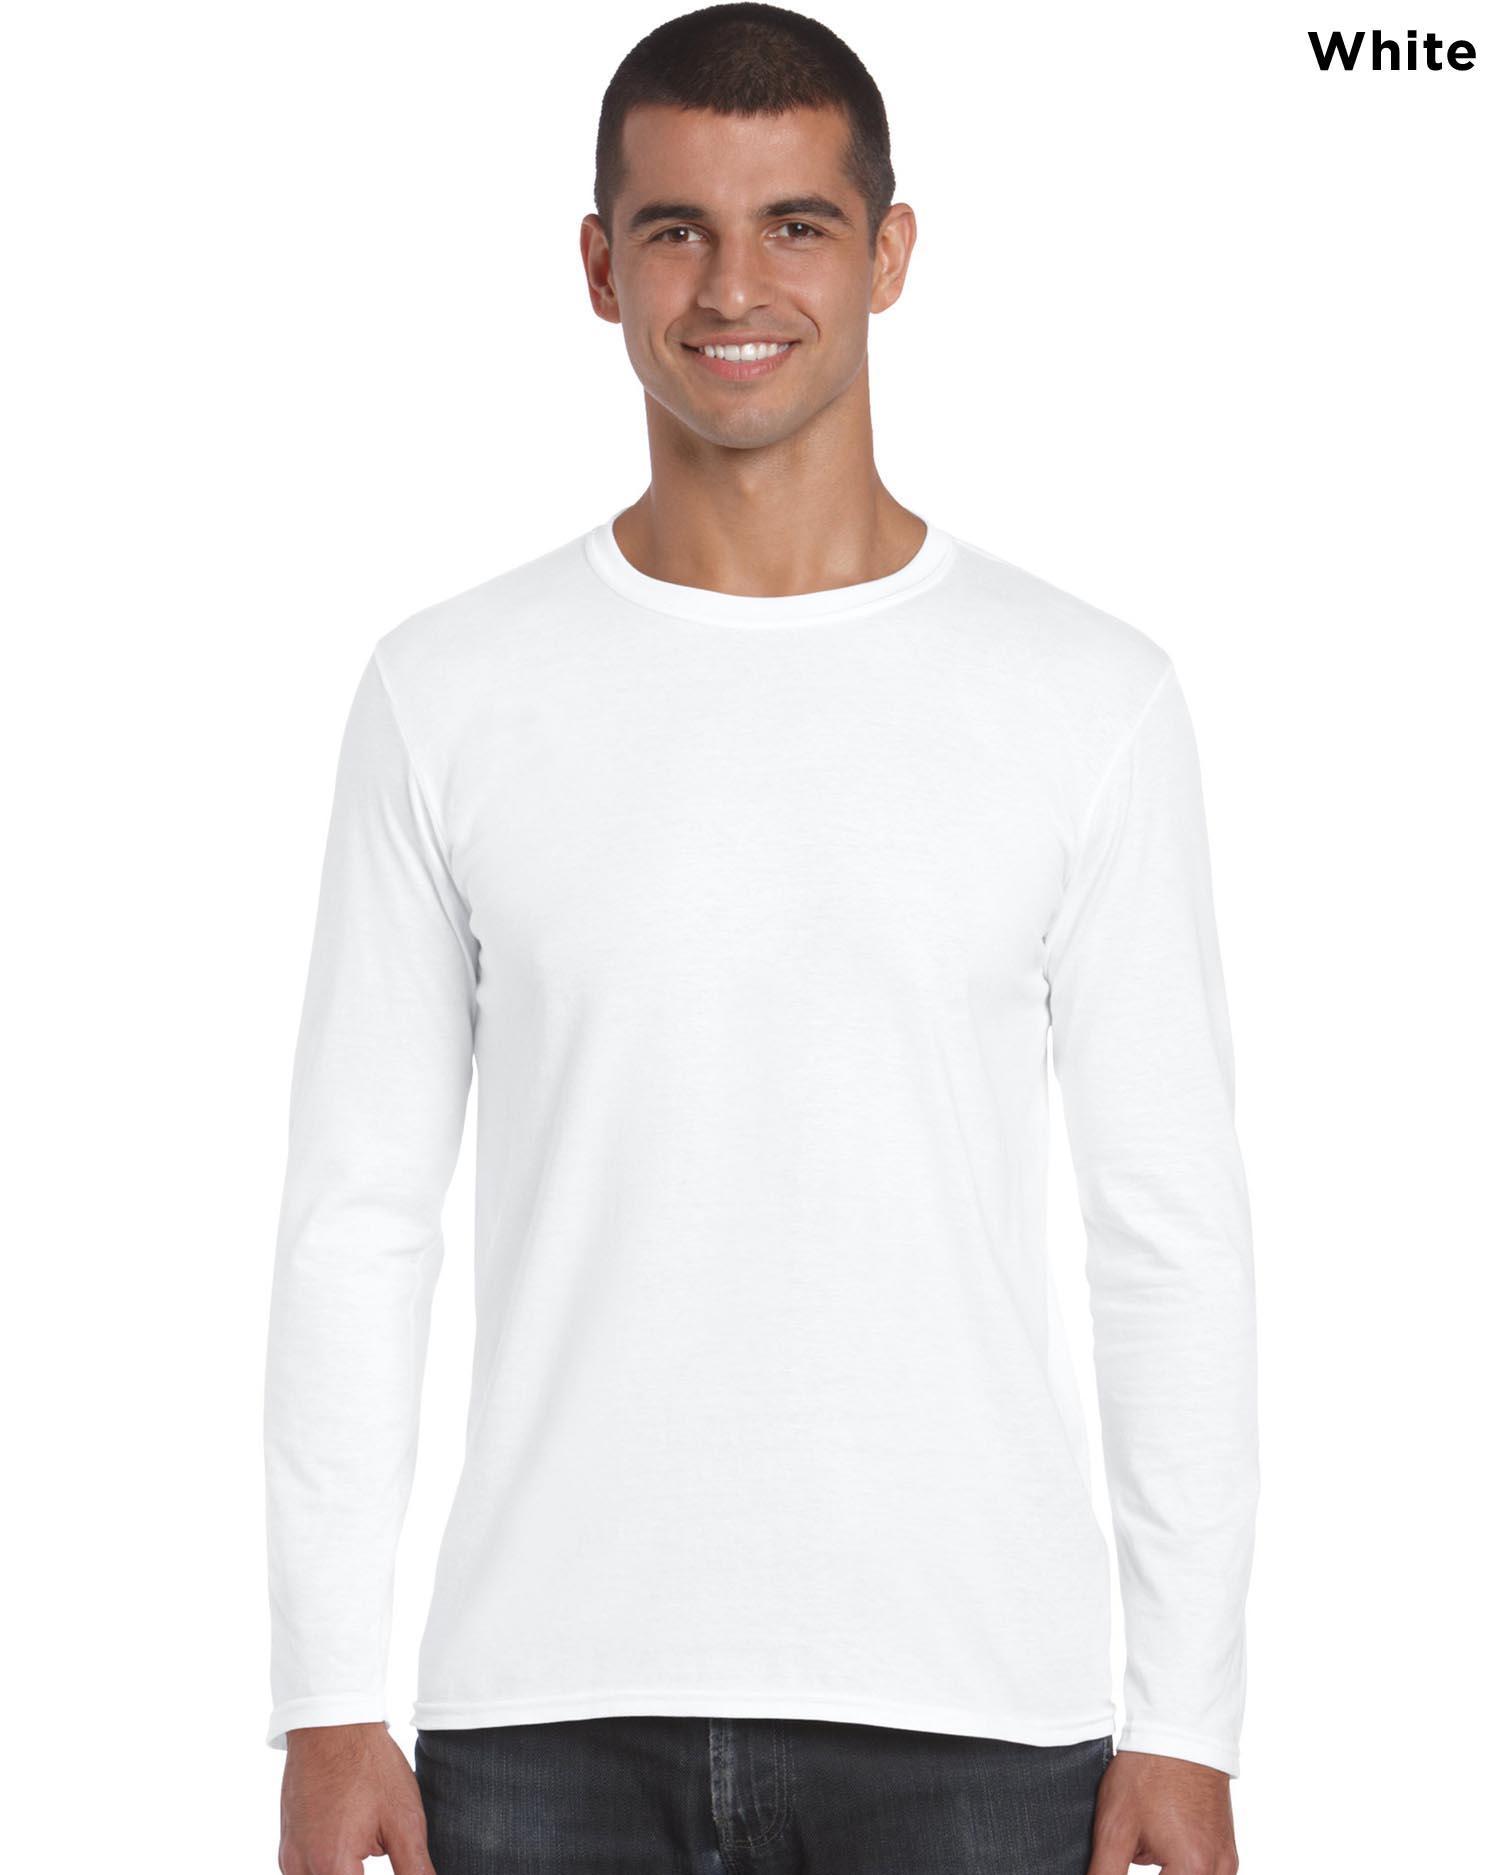 Gildan 76400 Premium Cotton Long Sleeve Tee Image